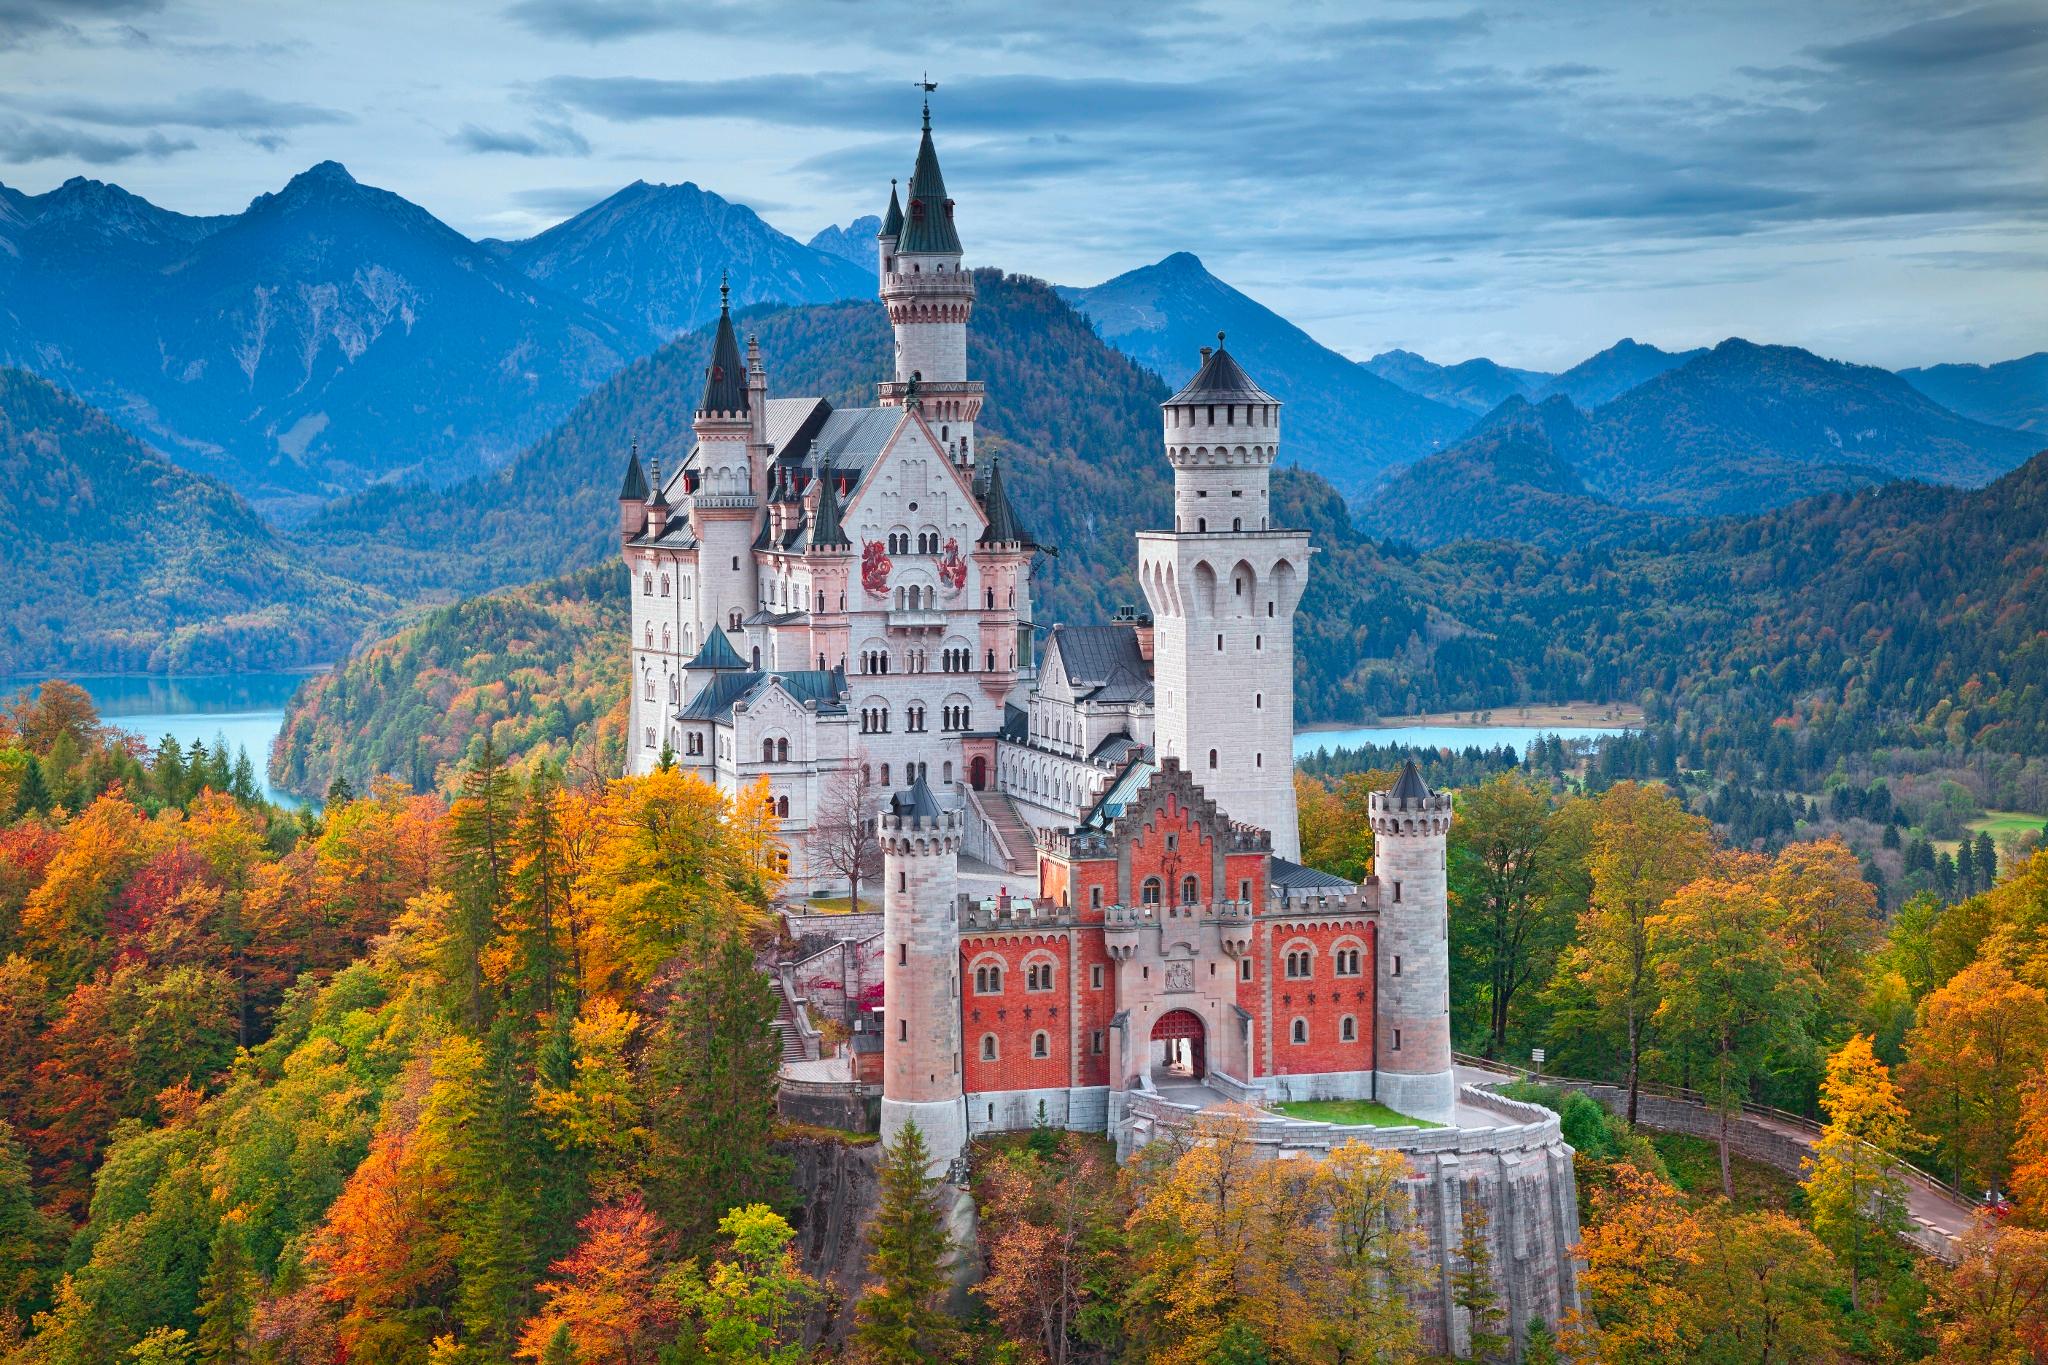 архитектура страны Замок Нойшванштайн Швангау Германия  № 2231500 бесплатно